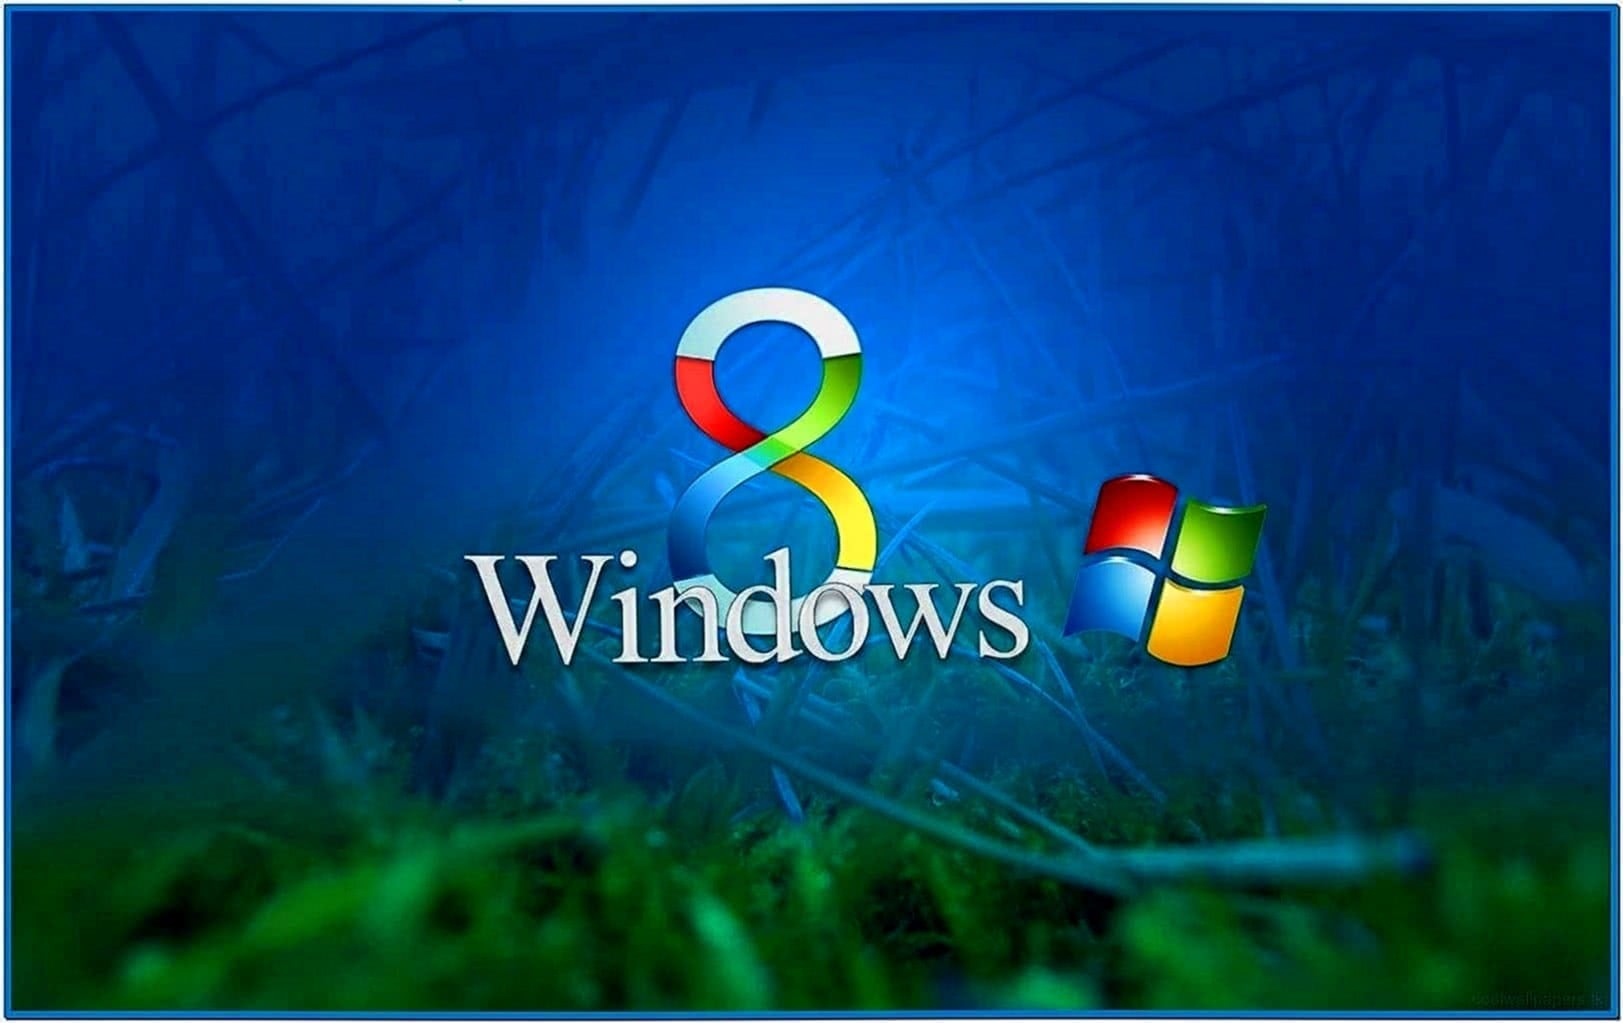 Windows 8 Screensavers XP